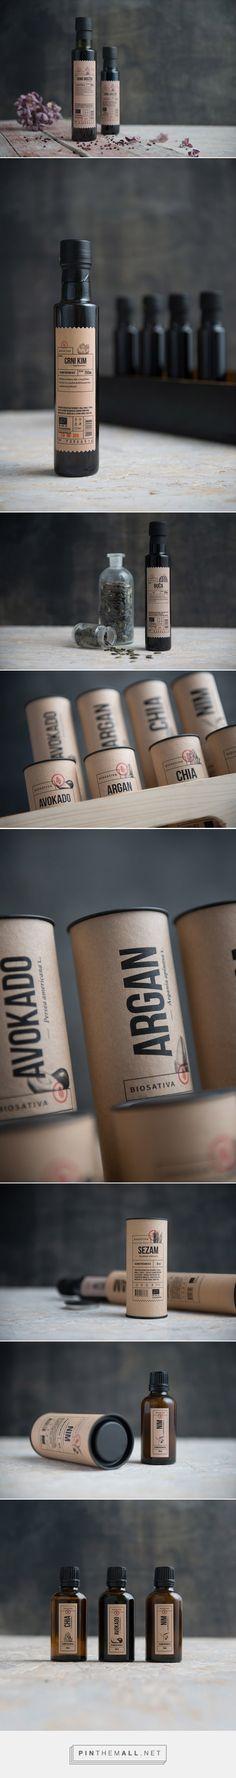 #packaging #design #branding #identity